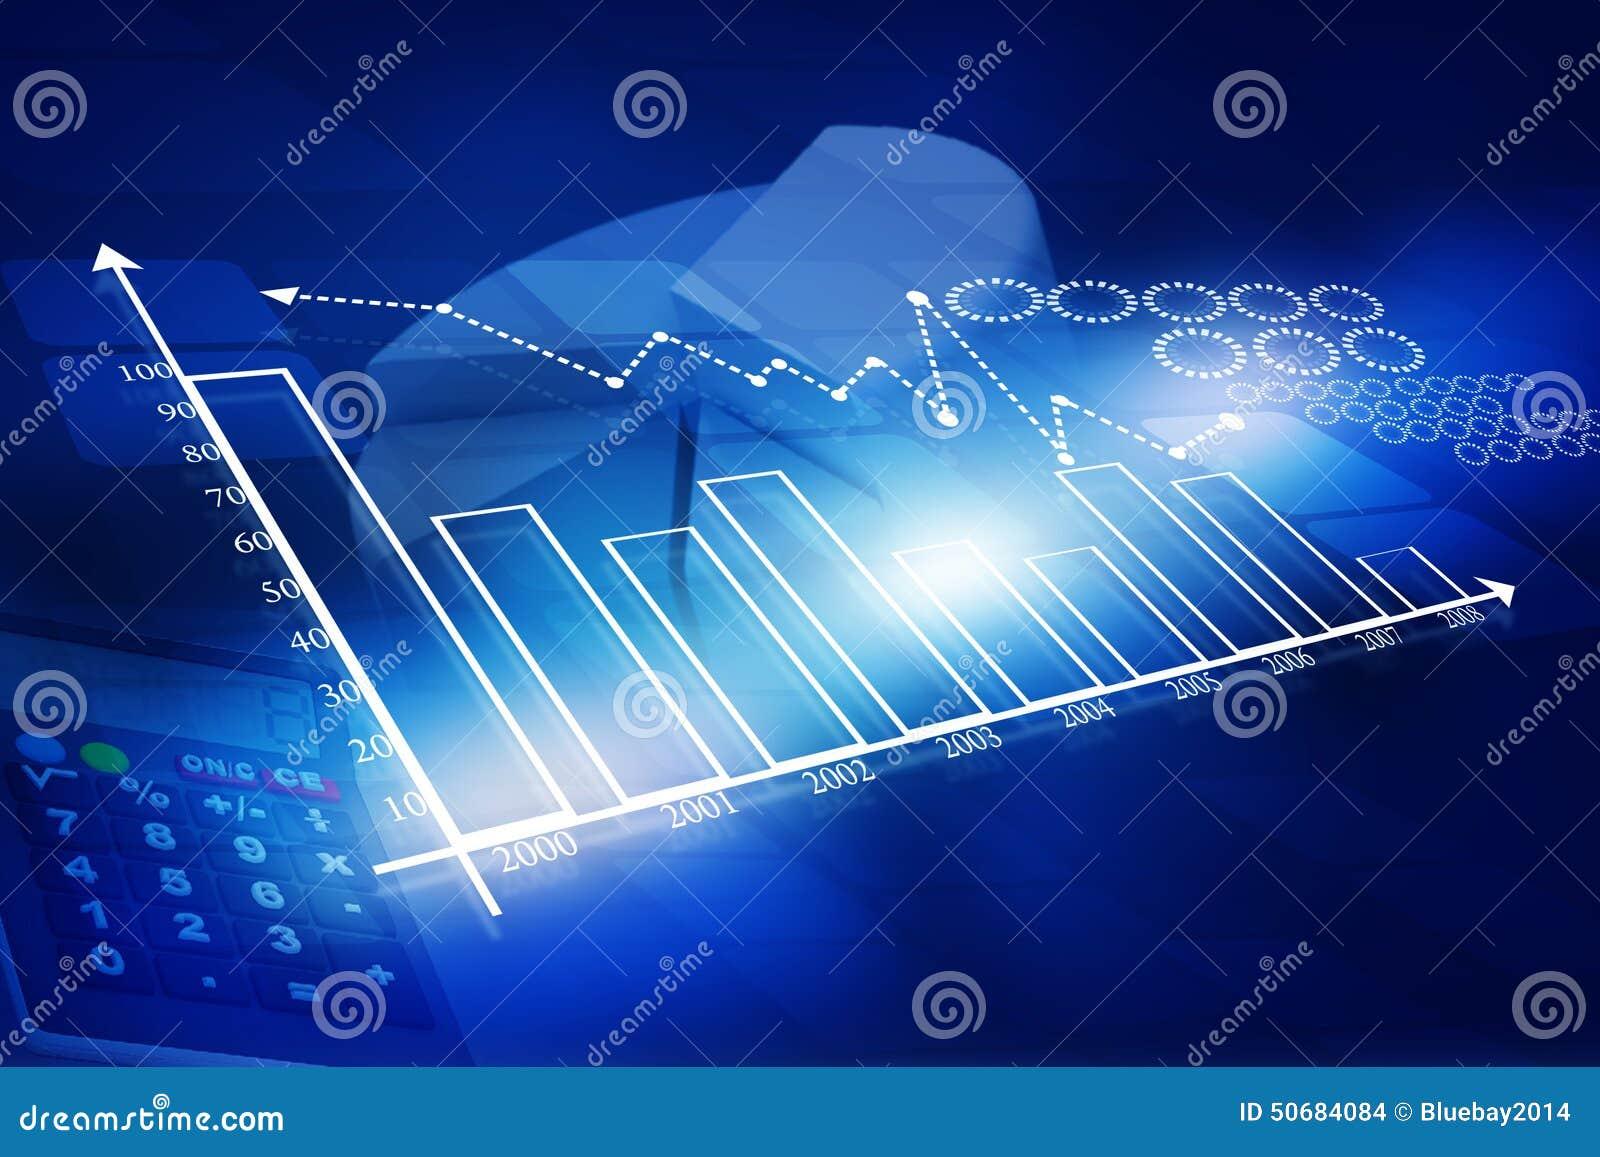 Download 企业动态图形宏指令销售额 库存例证. 插画 包括有 绘制, 图表, 商业, 横幅提供资金的, 图形, 背包 - 50684084